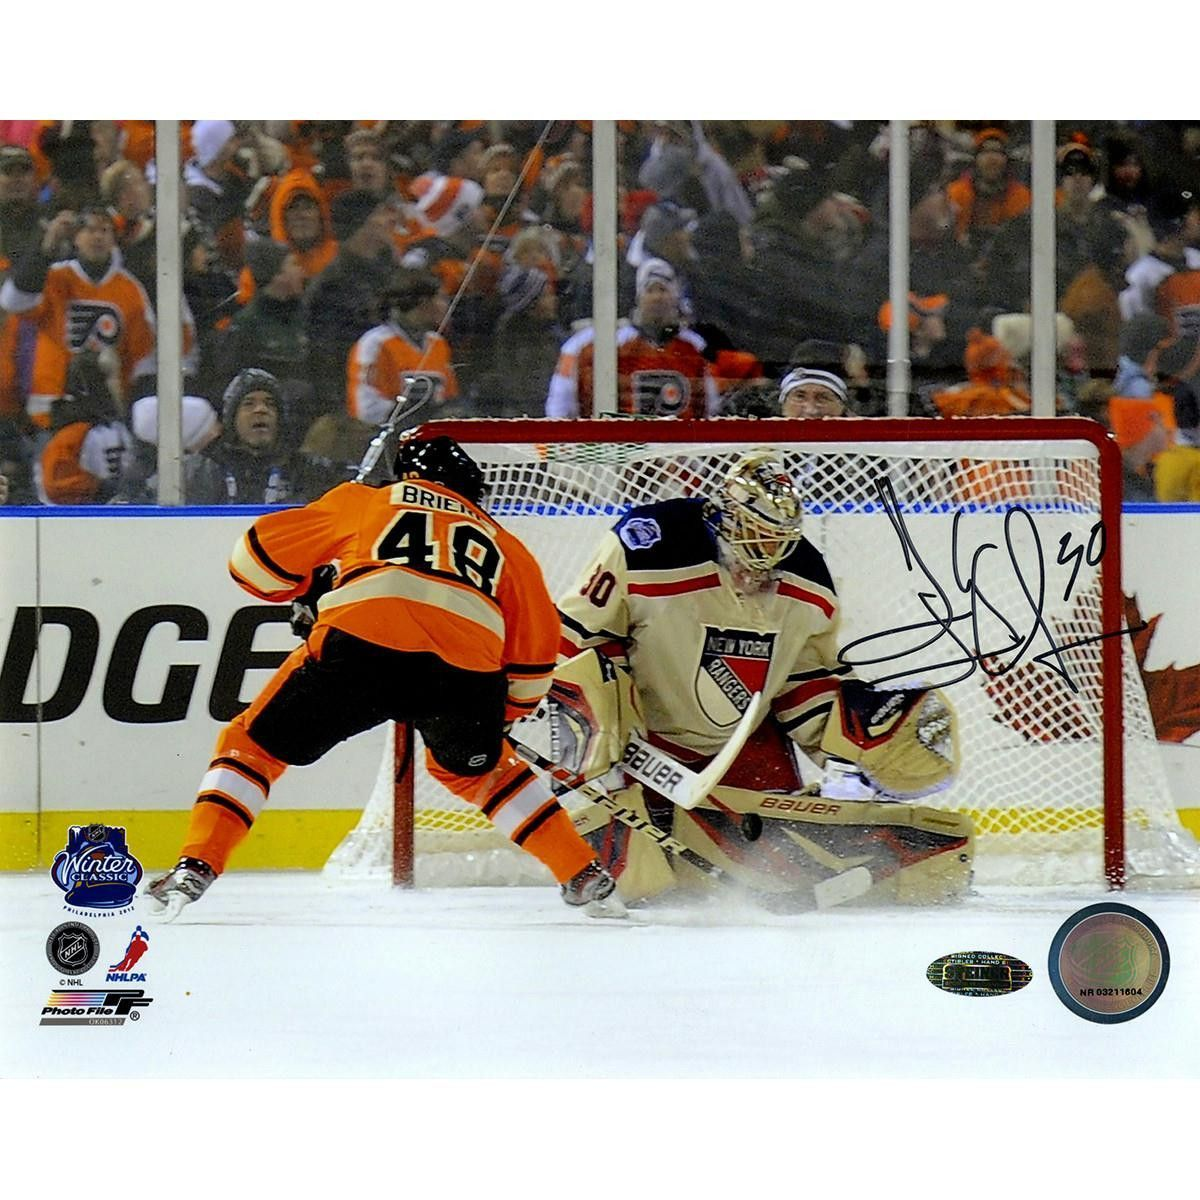 Henrik Lundqvist Penalty Shot Save vs Danny Briere 2012 Winter Classic  Horizontal 8x10 Photo (Signed in Black) 7c0da5fd2